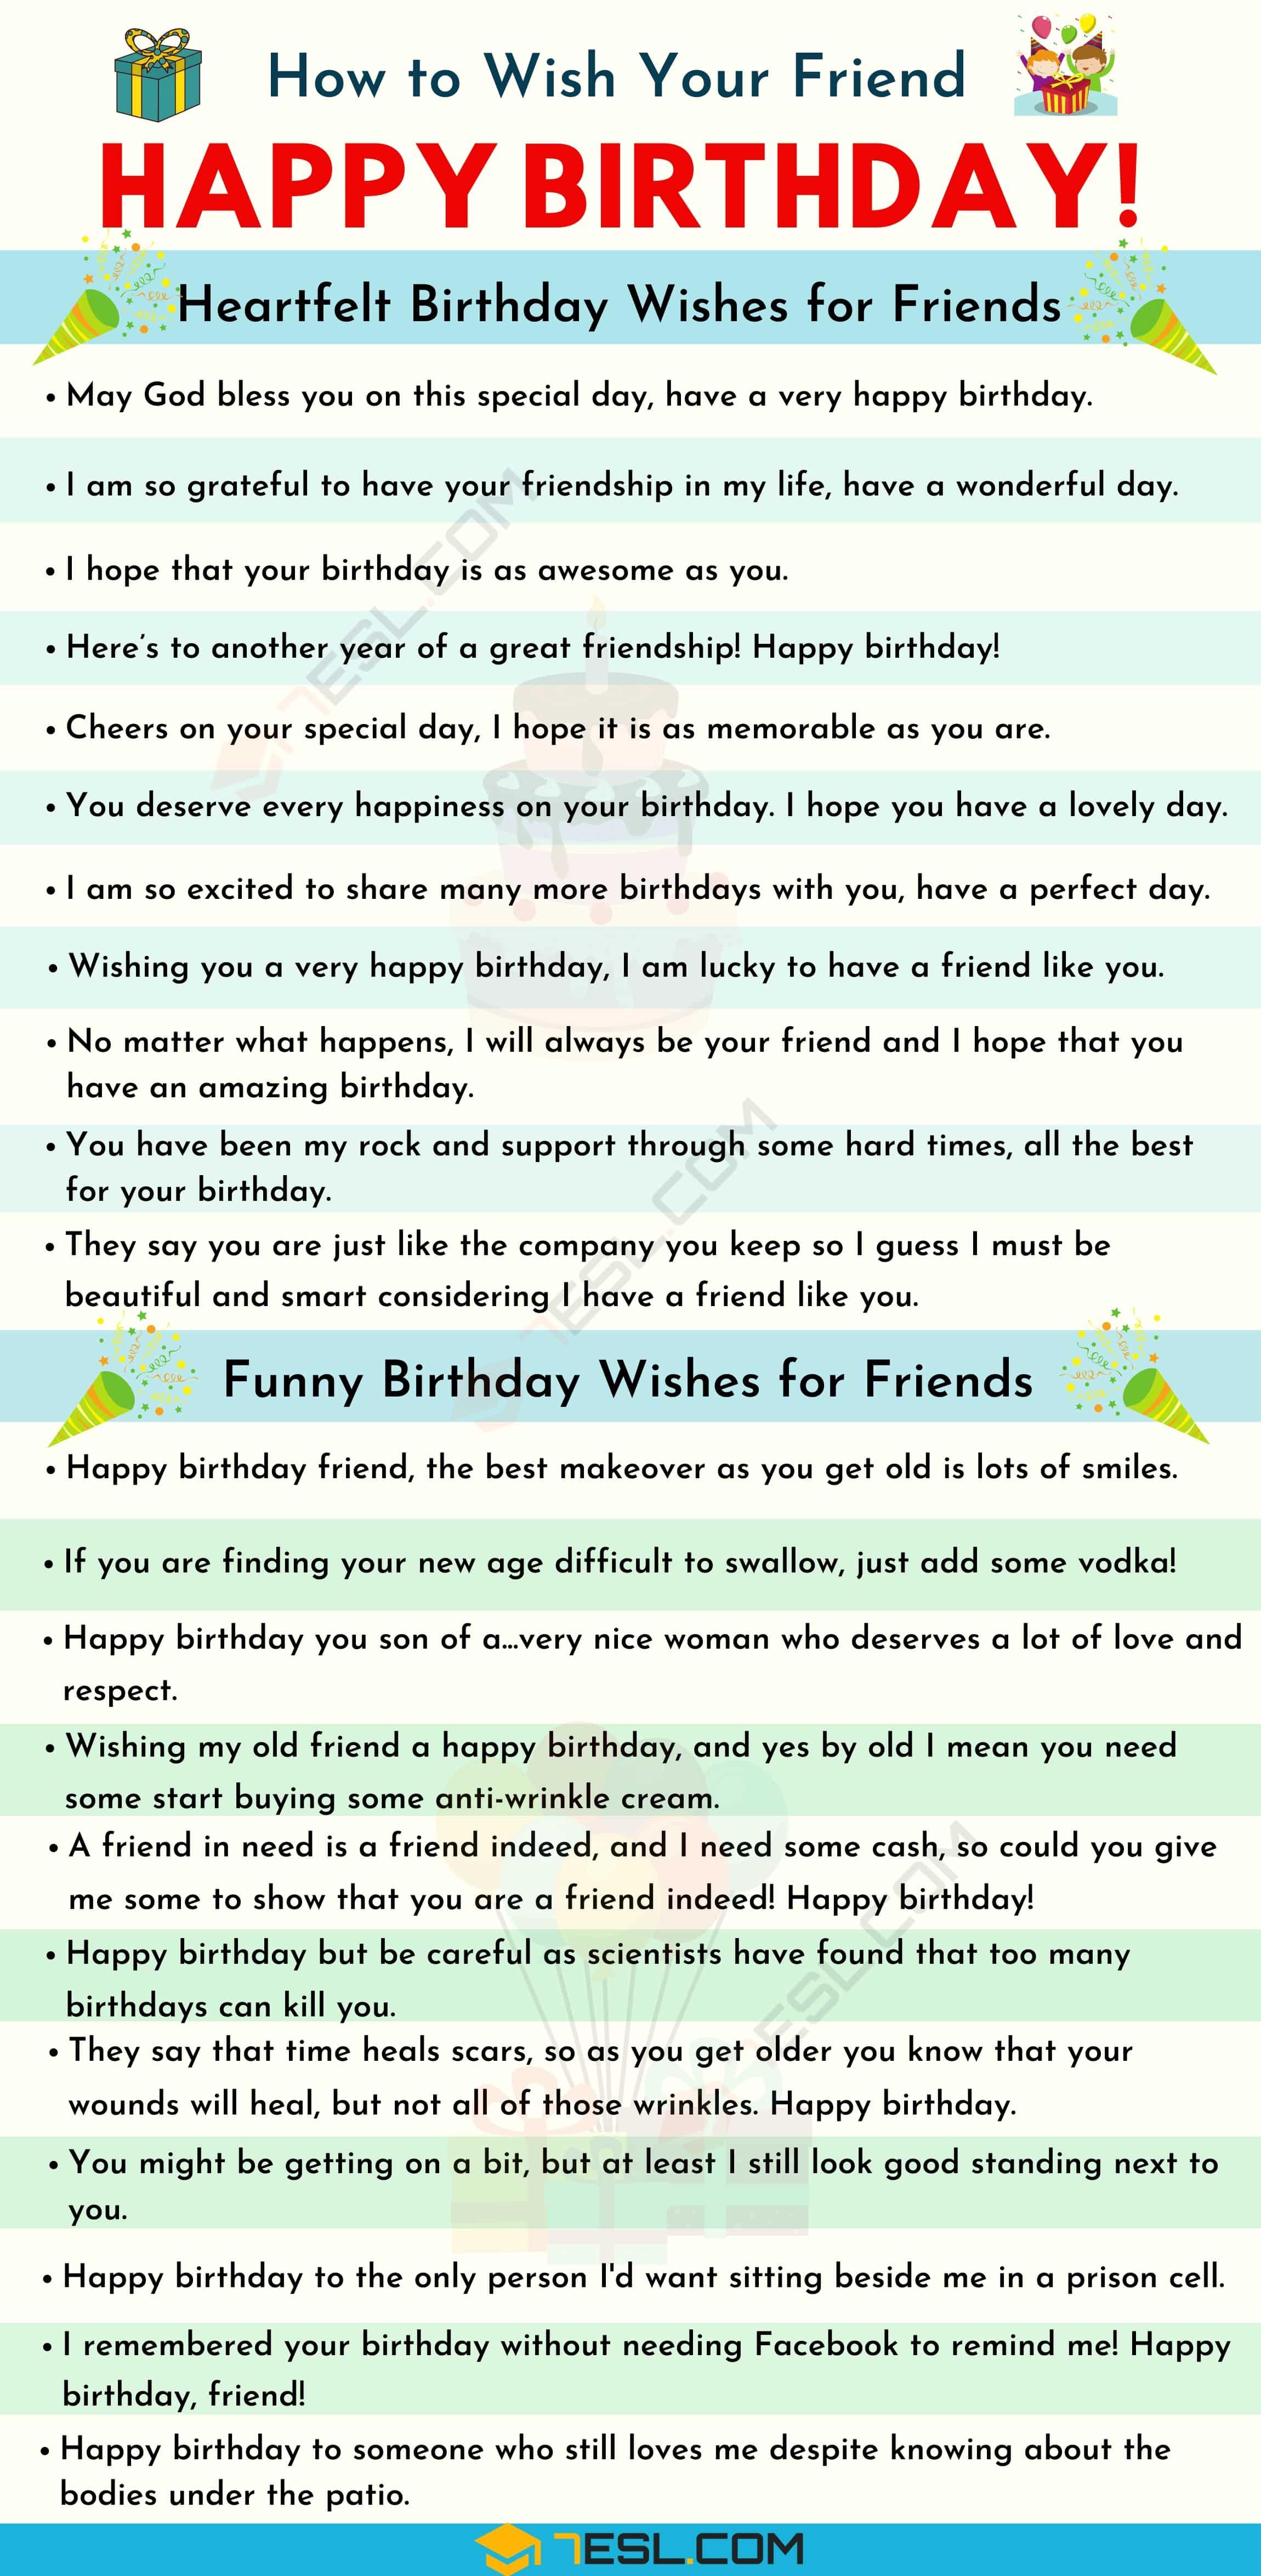 Happy Birthday Friend 35 Heartfelt And Funny Birthday Wishes For Friends 7esl